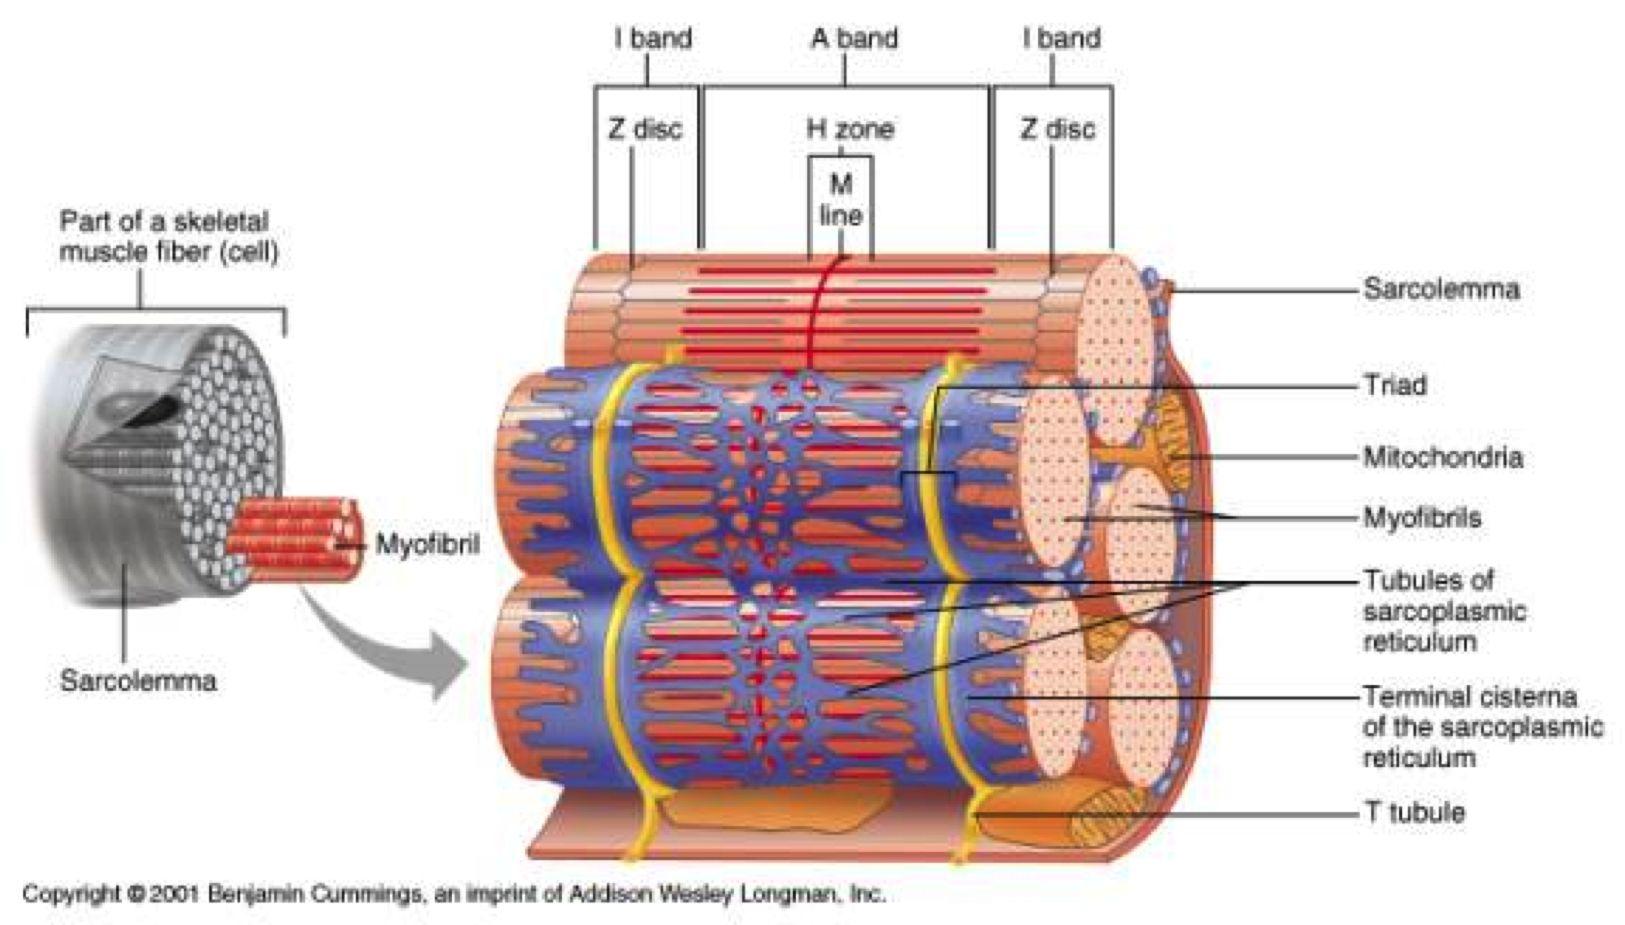 Muscle Fiber Image Unlabeled Muscle Fiber Image Unlabeled Study Guide Torry Lichaam Spelletjes